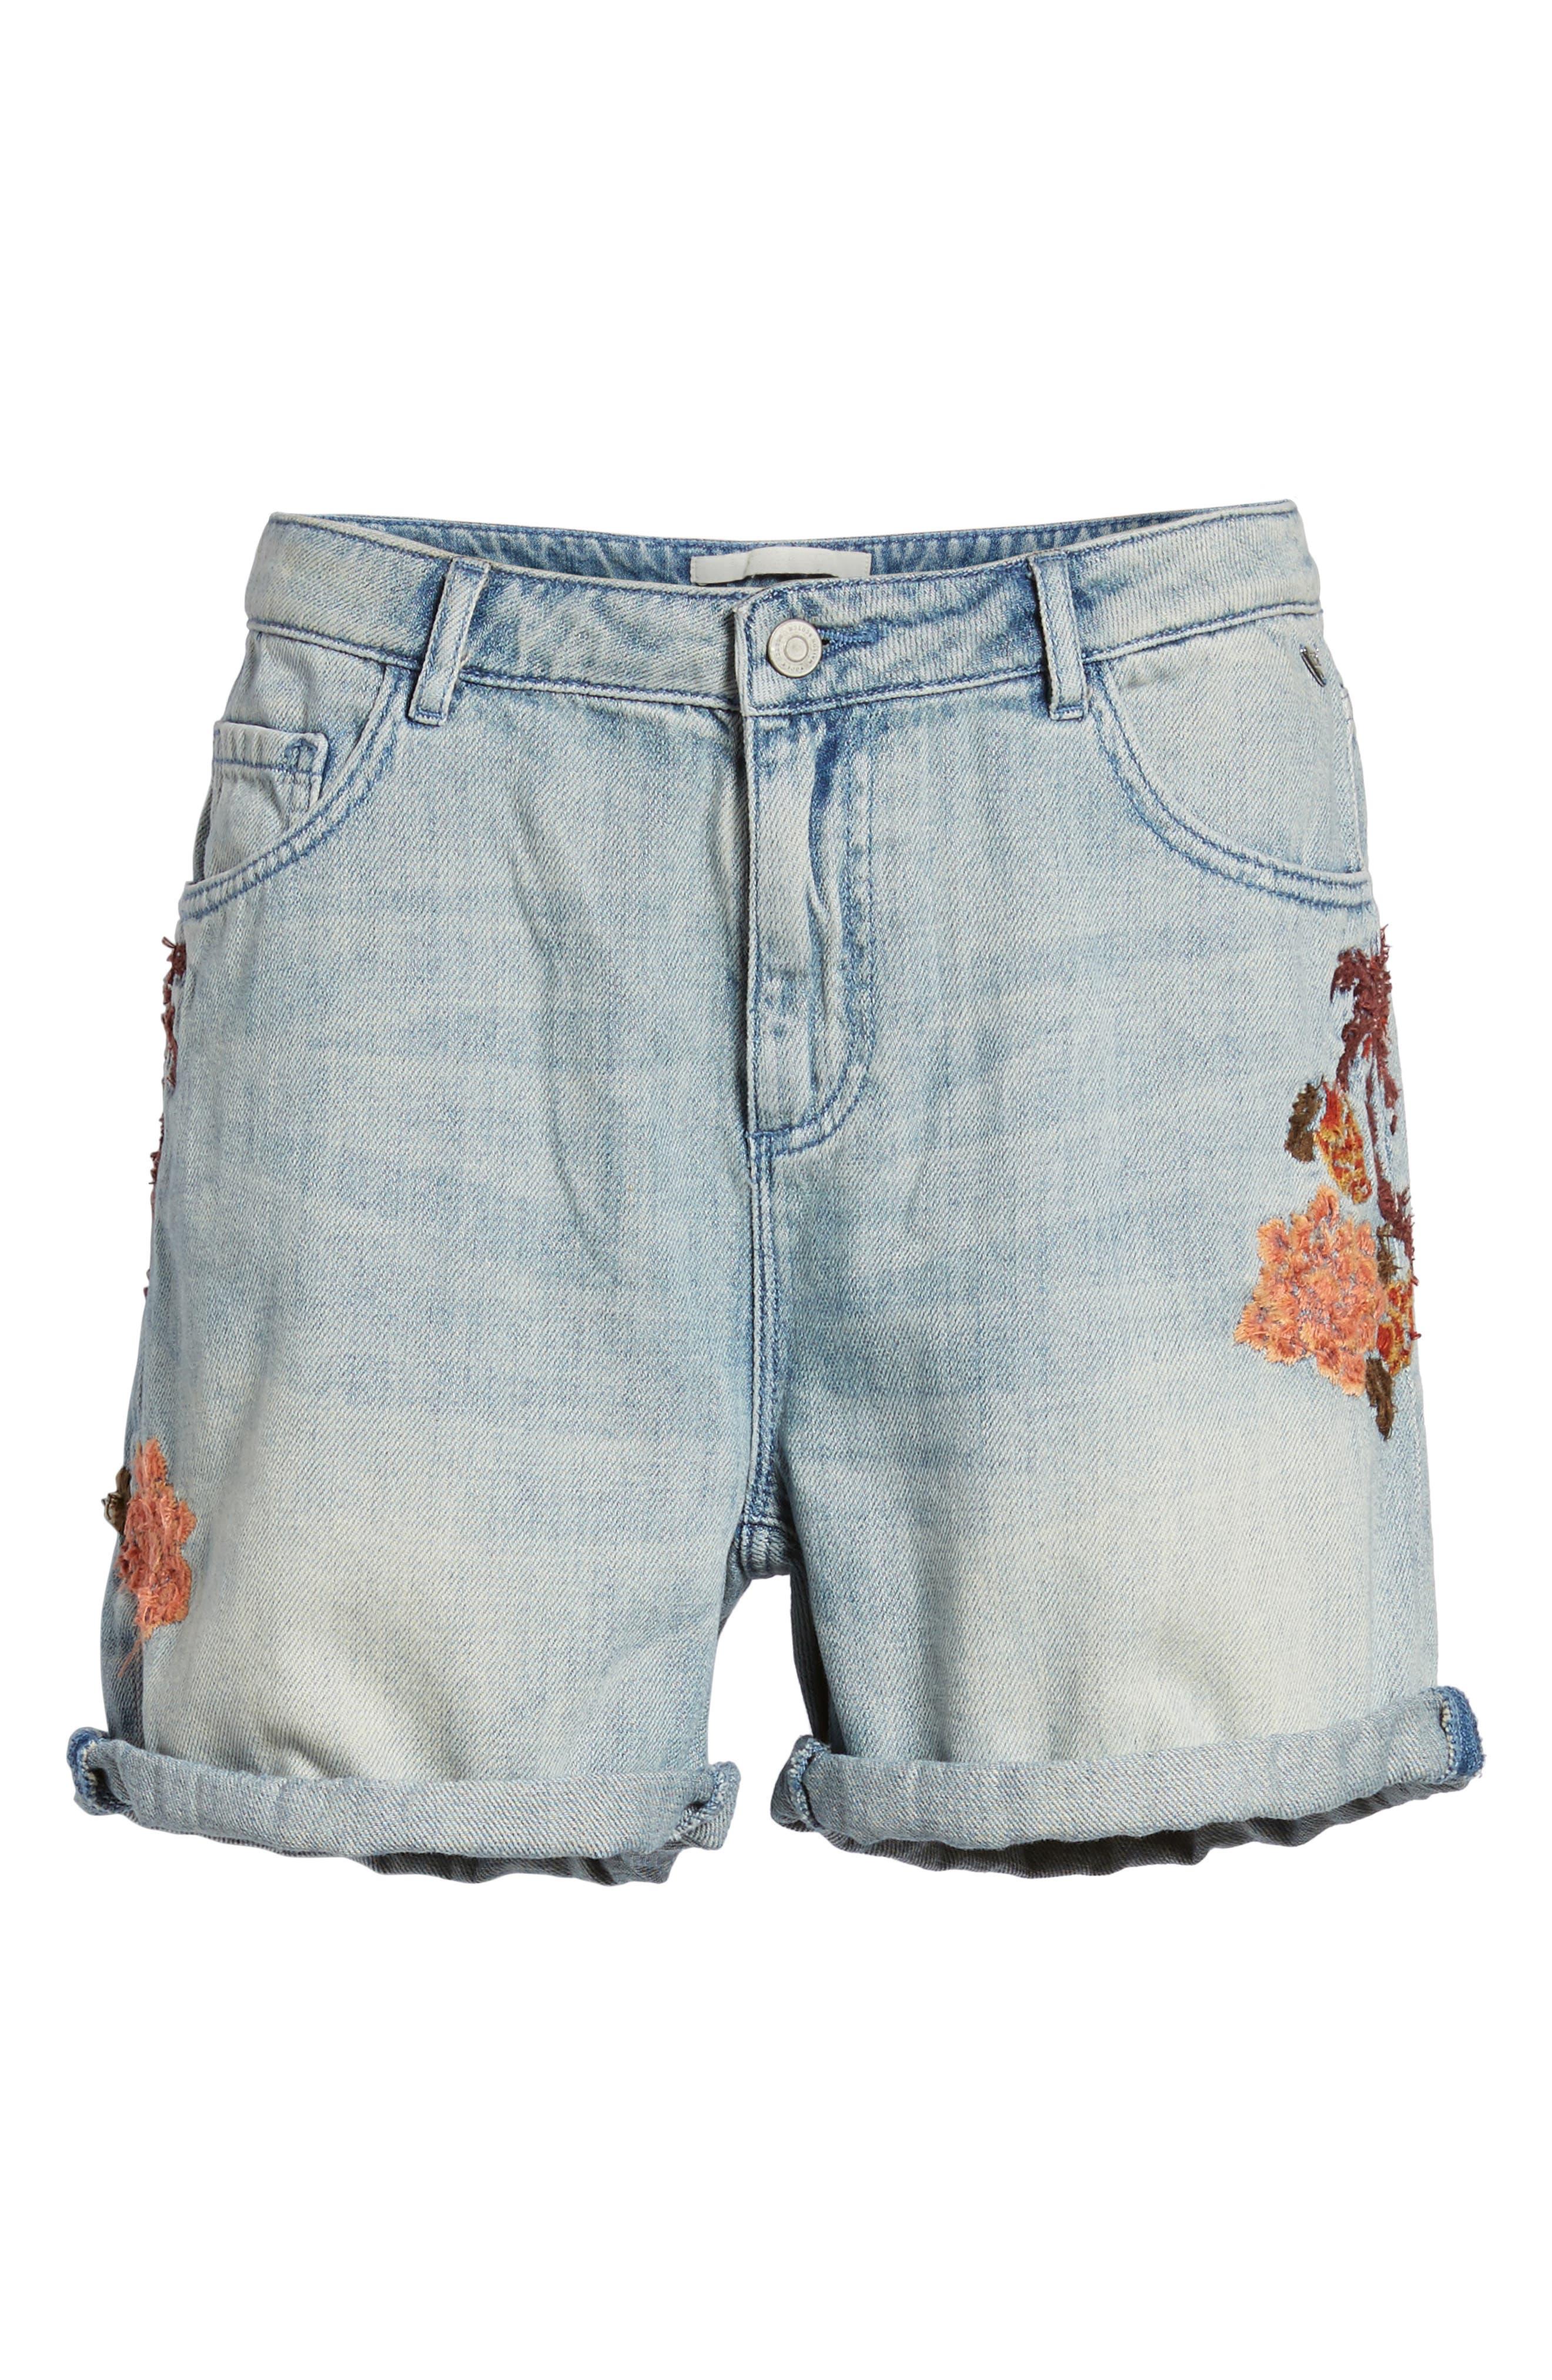 Embroidered Boyfriend Denim Shorts,                             Alternate thumbnail 6, color,                             420